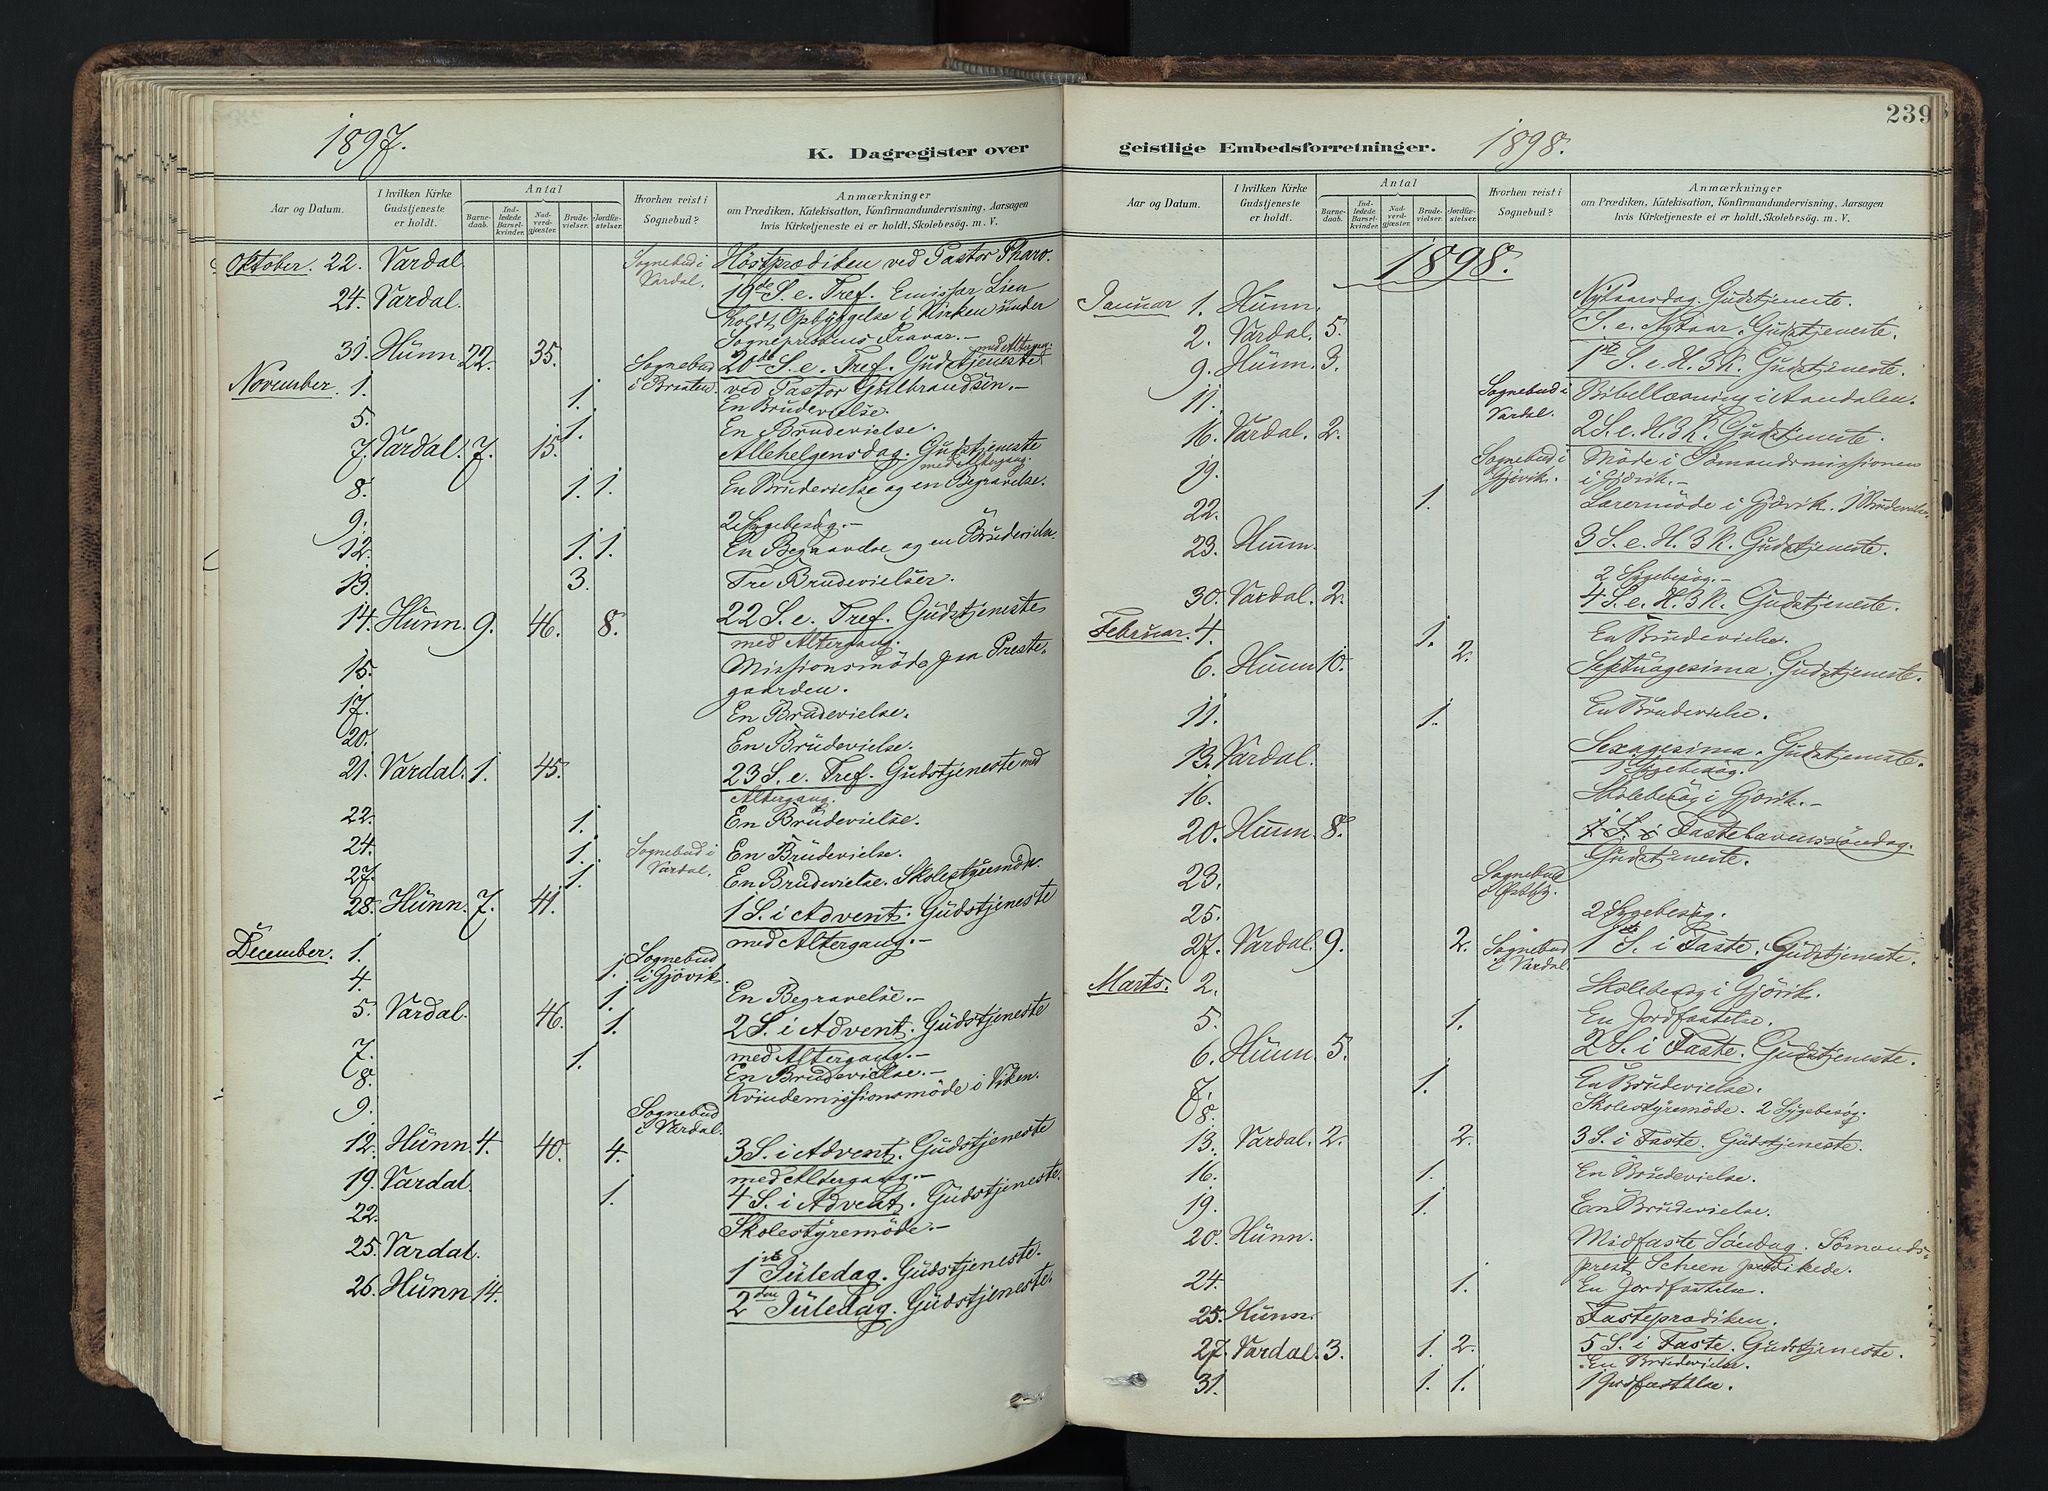 SAH, Vardal prestekontor, H/Ha/Haa/L0019: Ministerialbok nr. 19, 1893-1907, s. 239